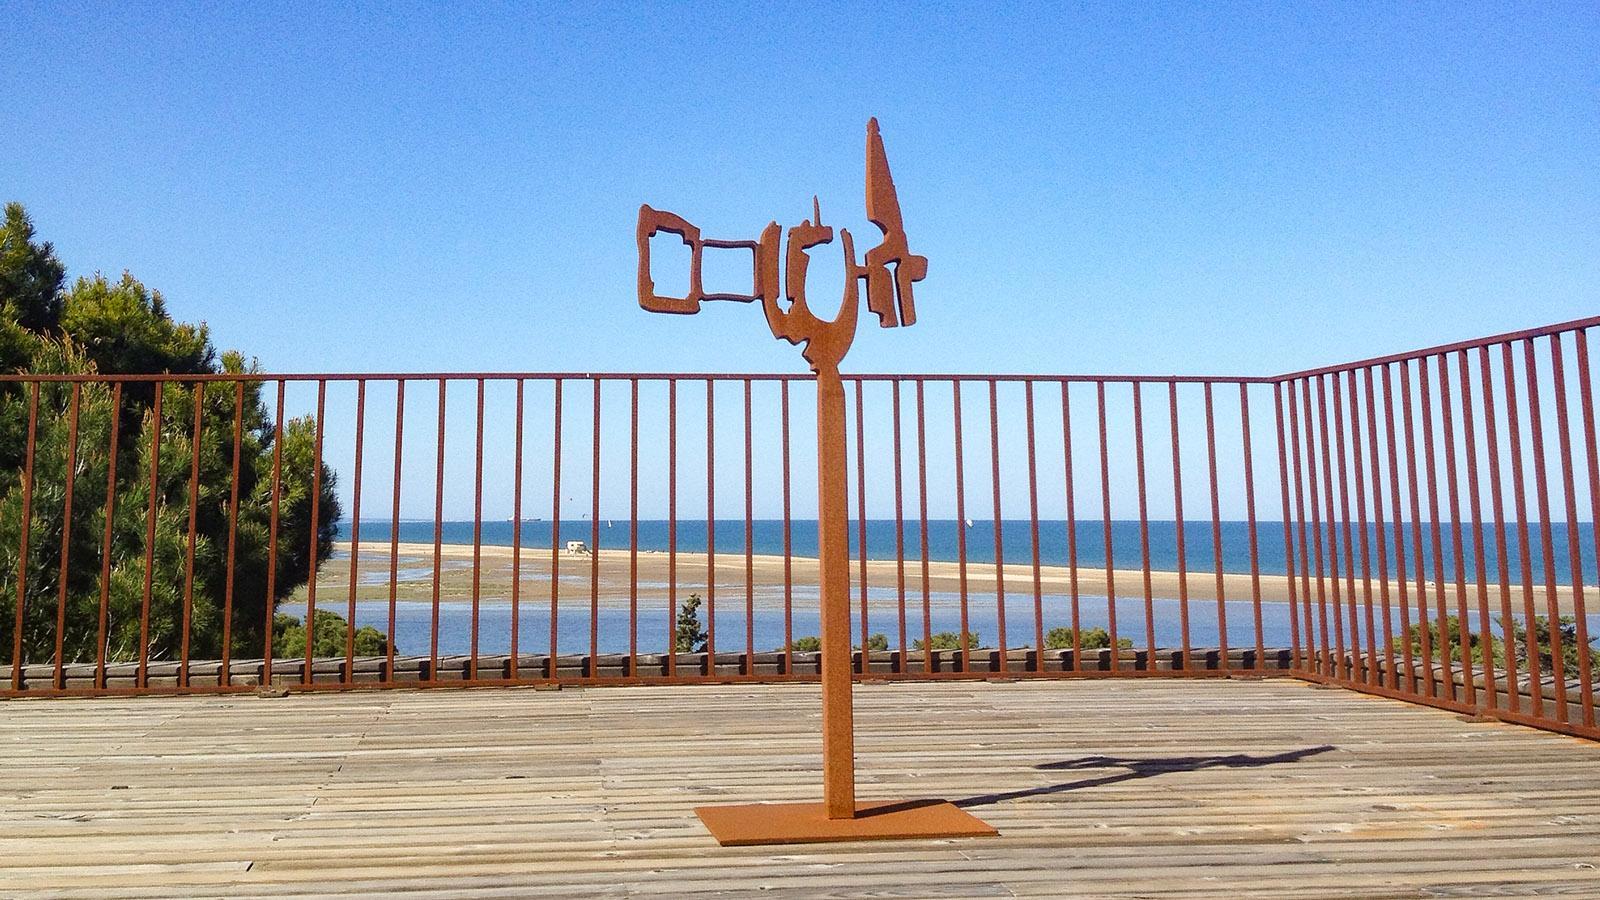 La Franqui: Skulptur von Patrick Chappert-Gaujal. Foto: Hilke Maunder